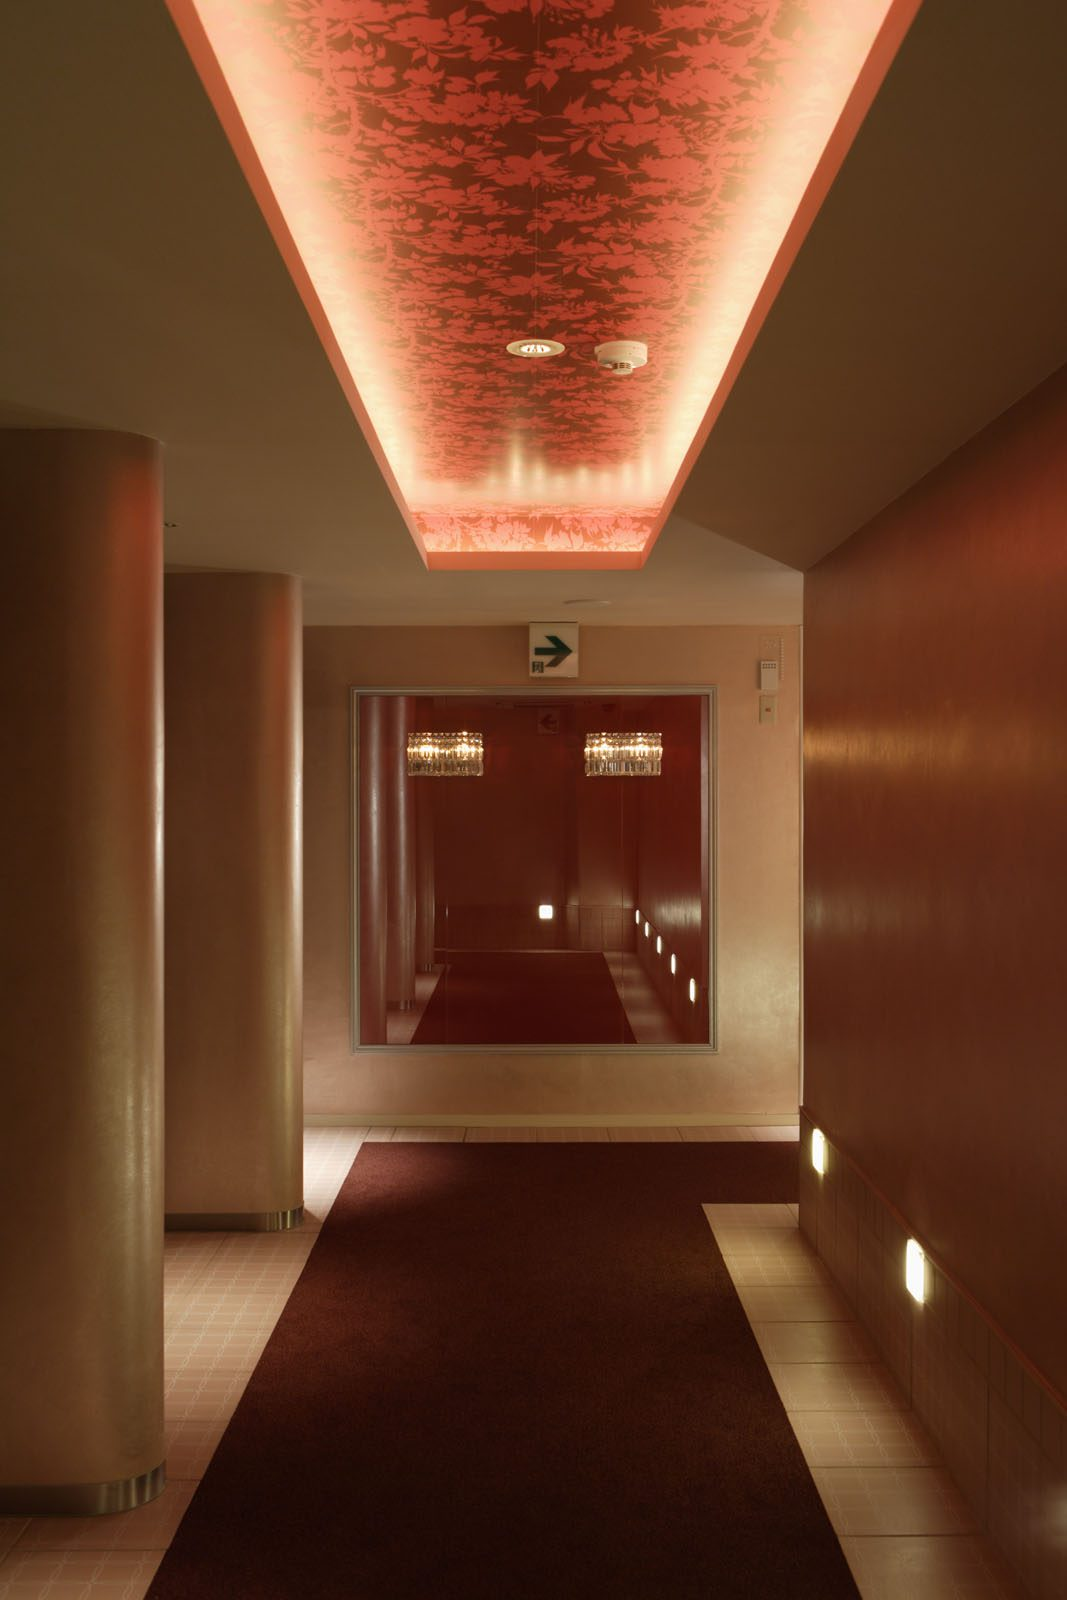 HOTEL-THE SCENE